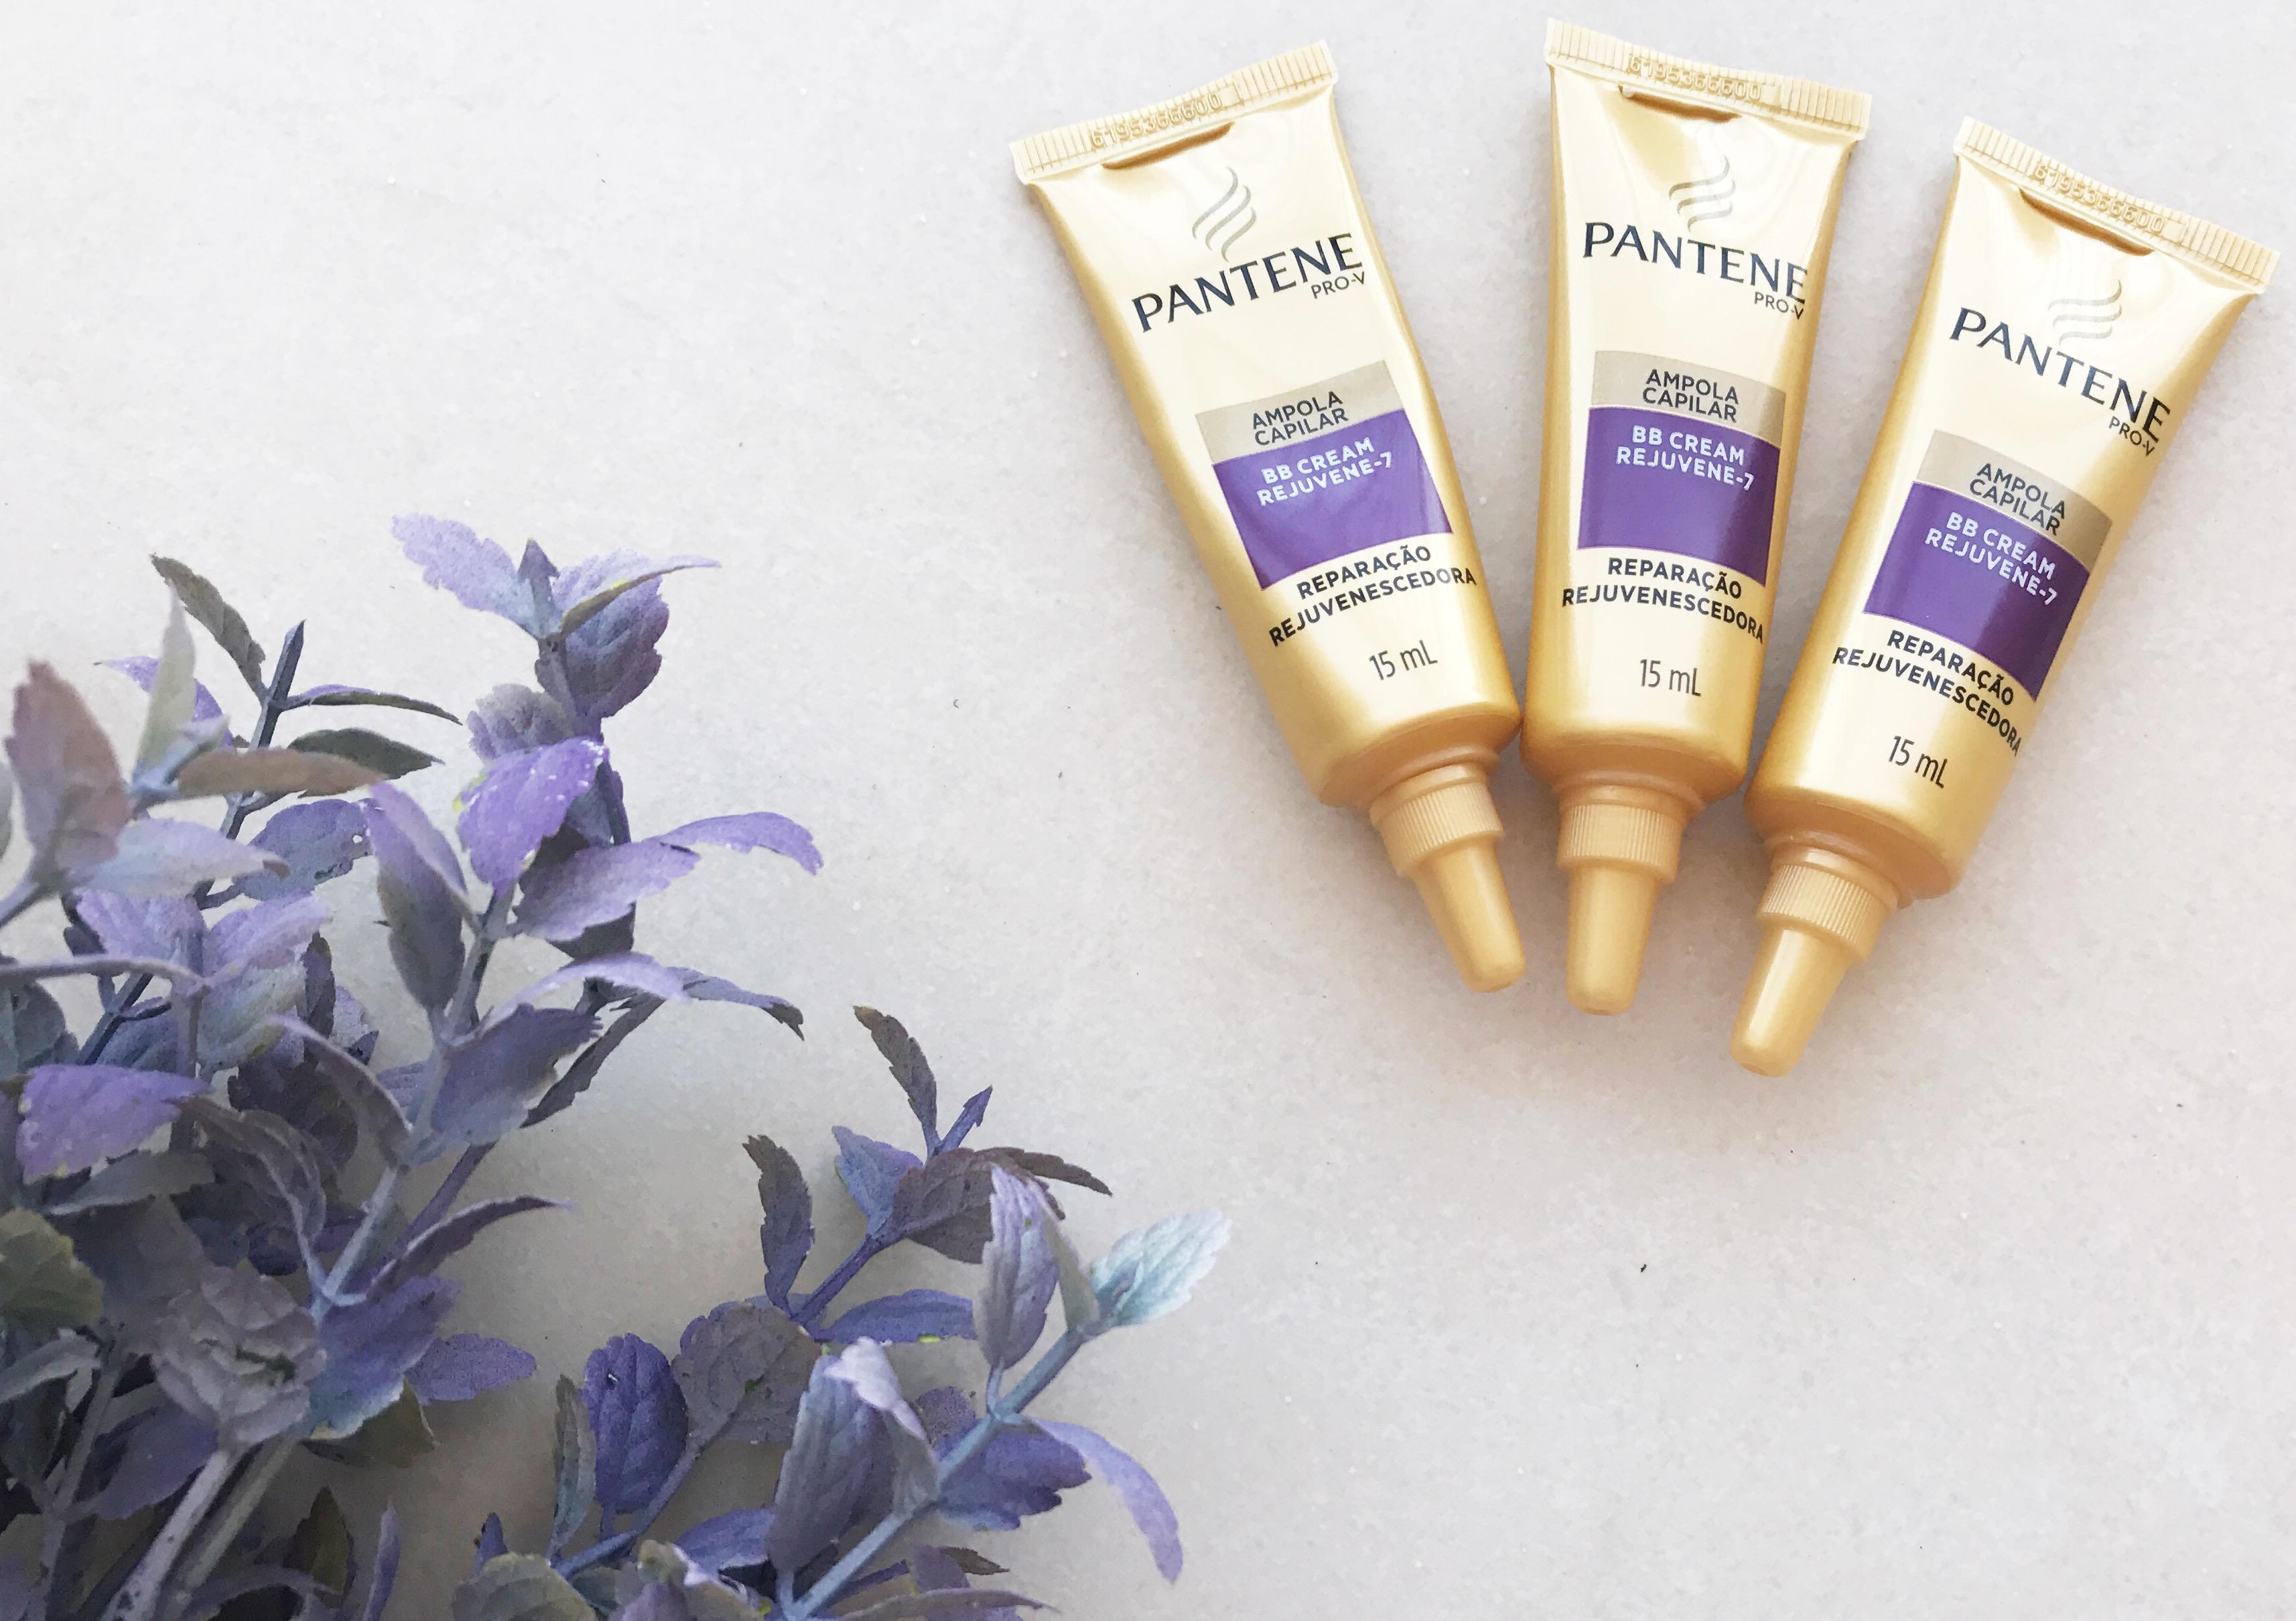 Pantene-BB-Cream-Rejuvene-Giuli-Castro